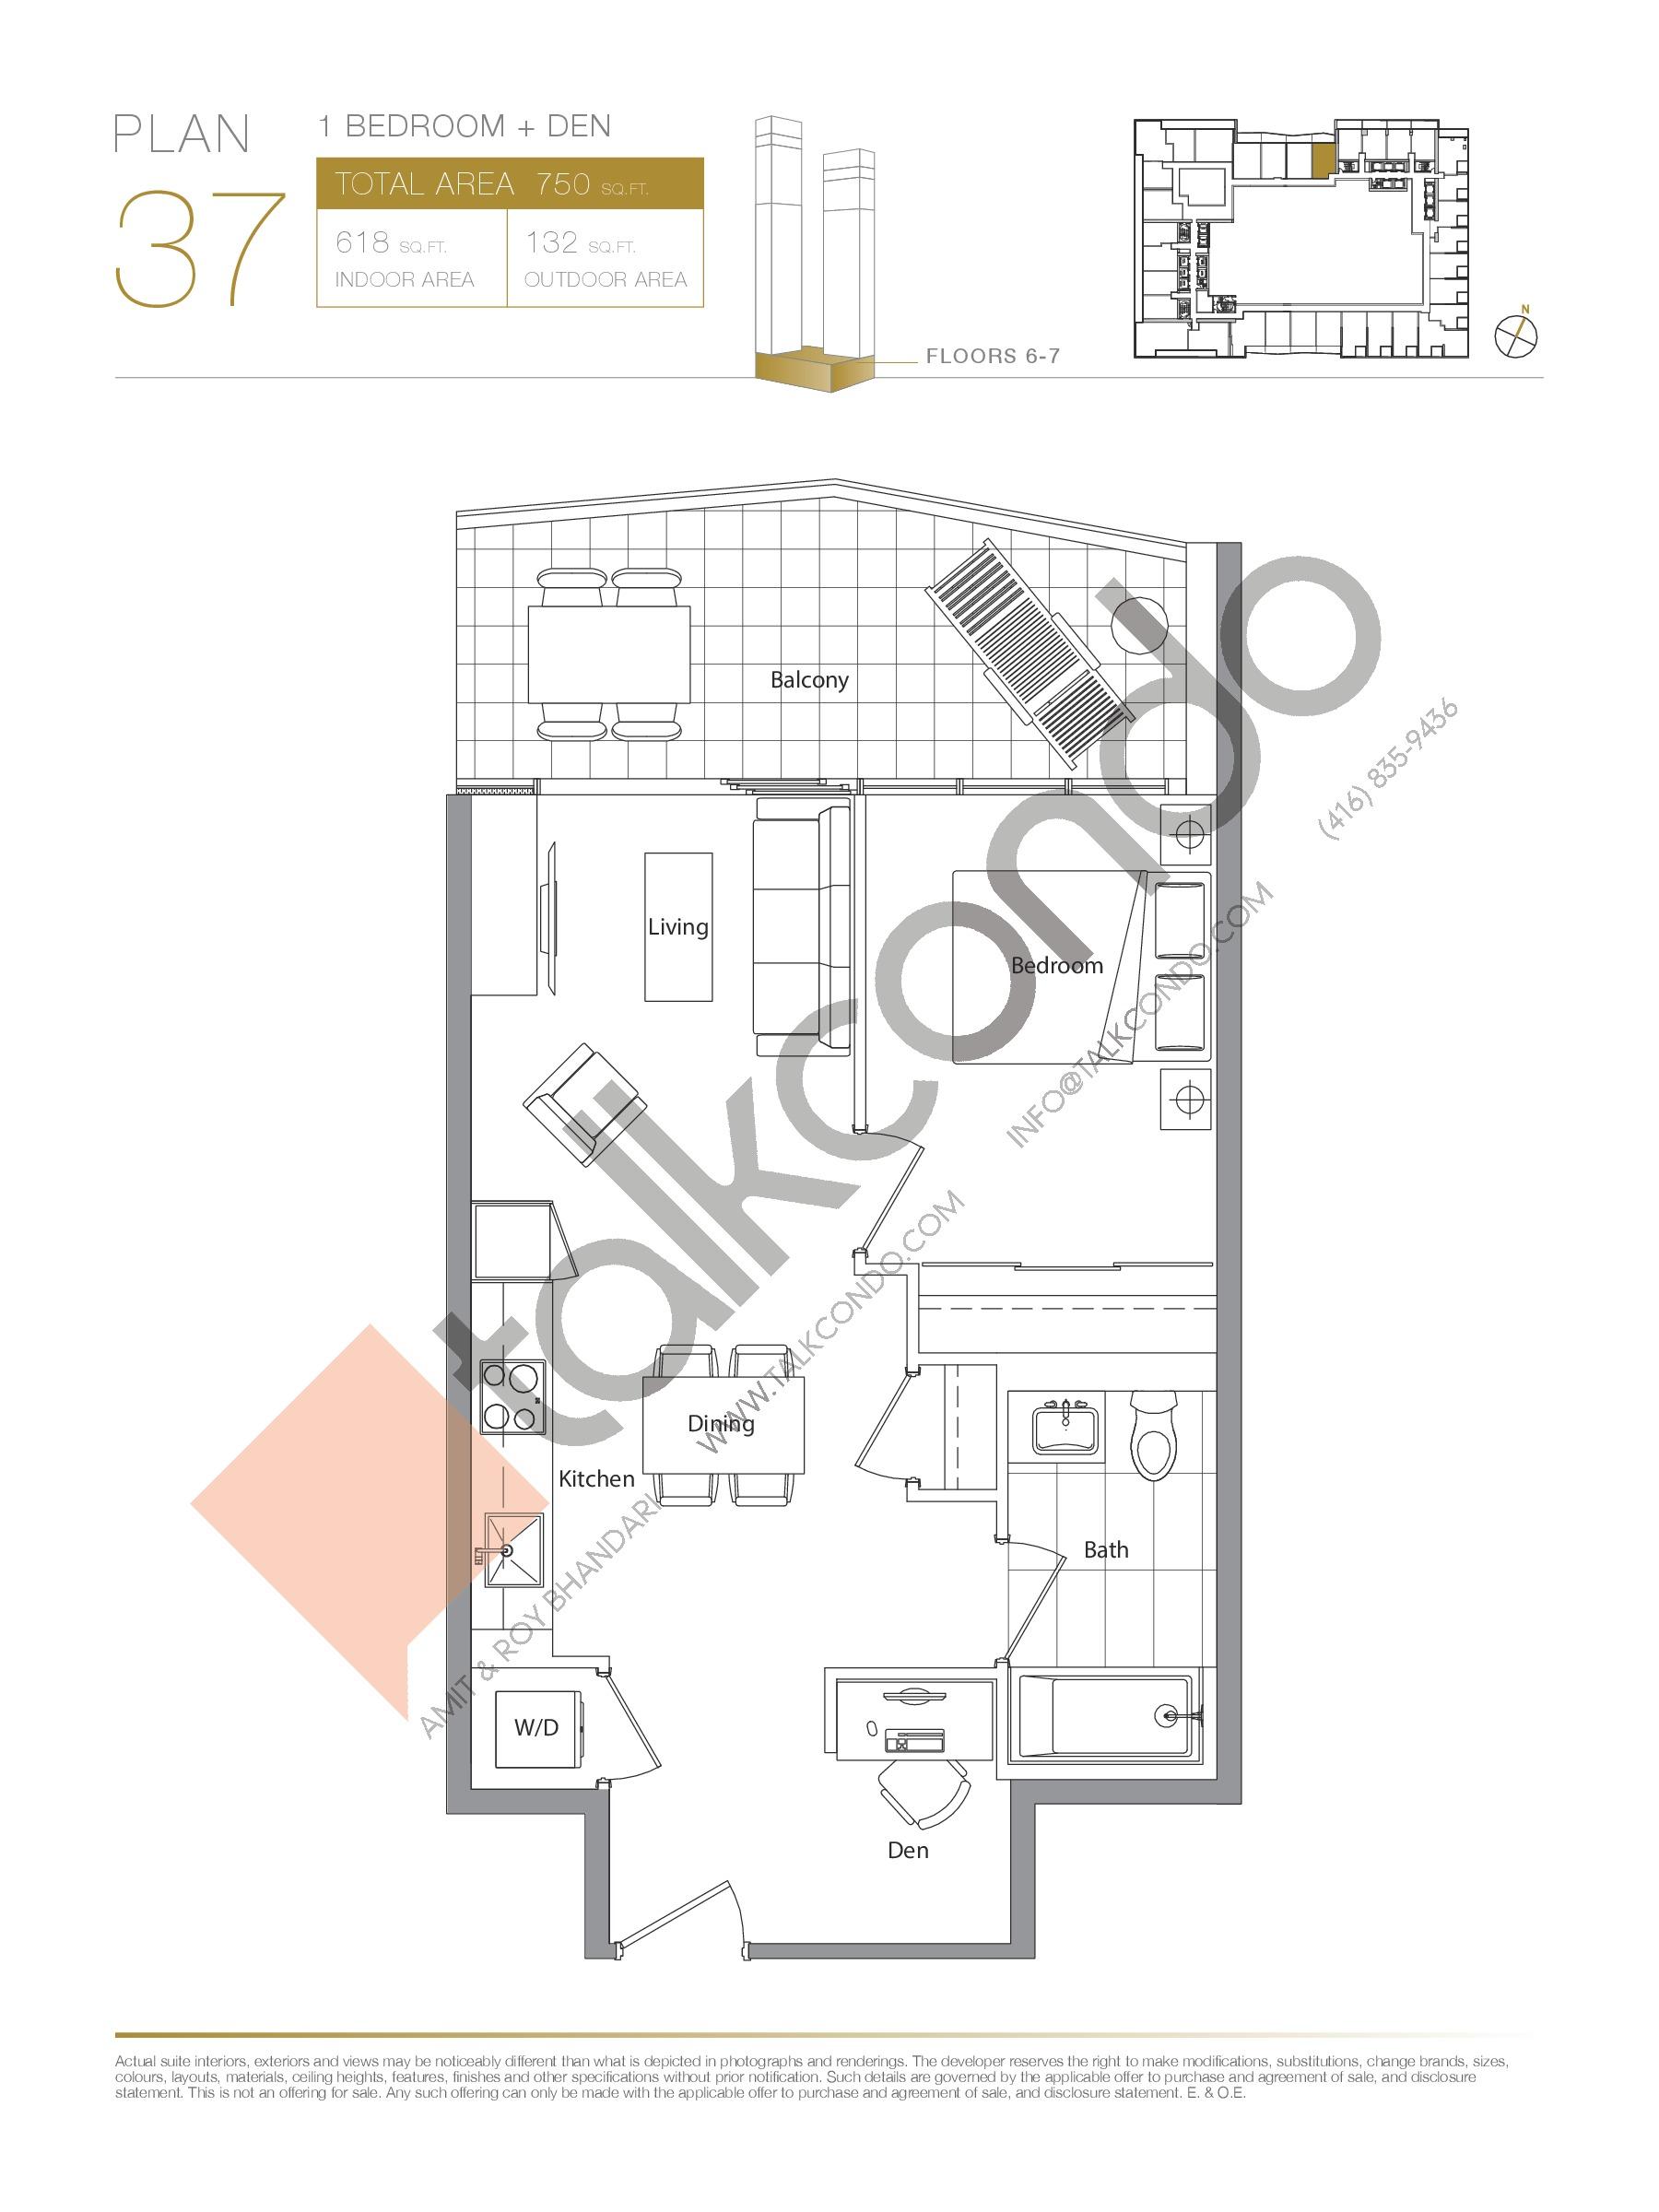 Plan 37 Floor Plan at Concord Canada House Condos - 618 sq.ft